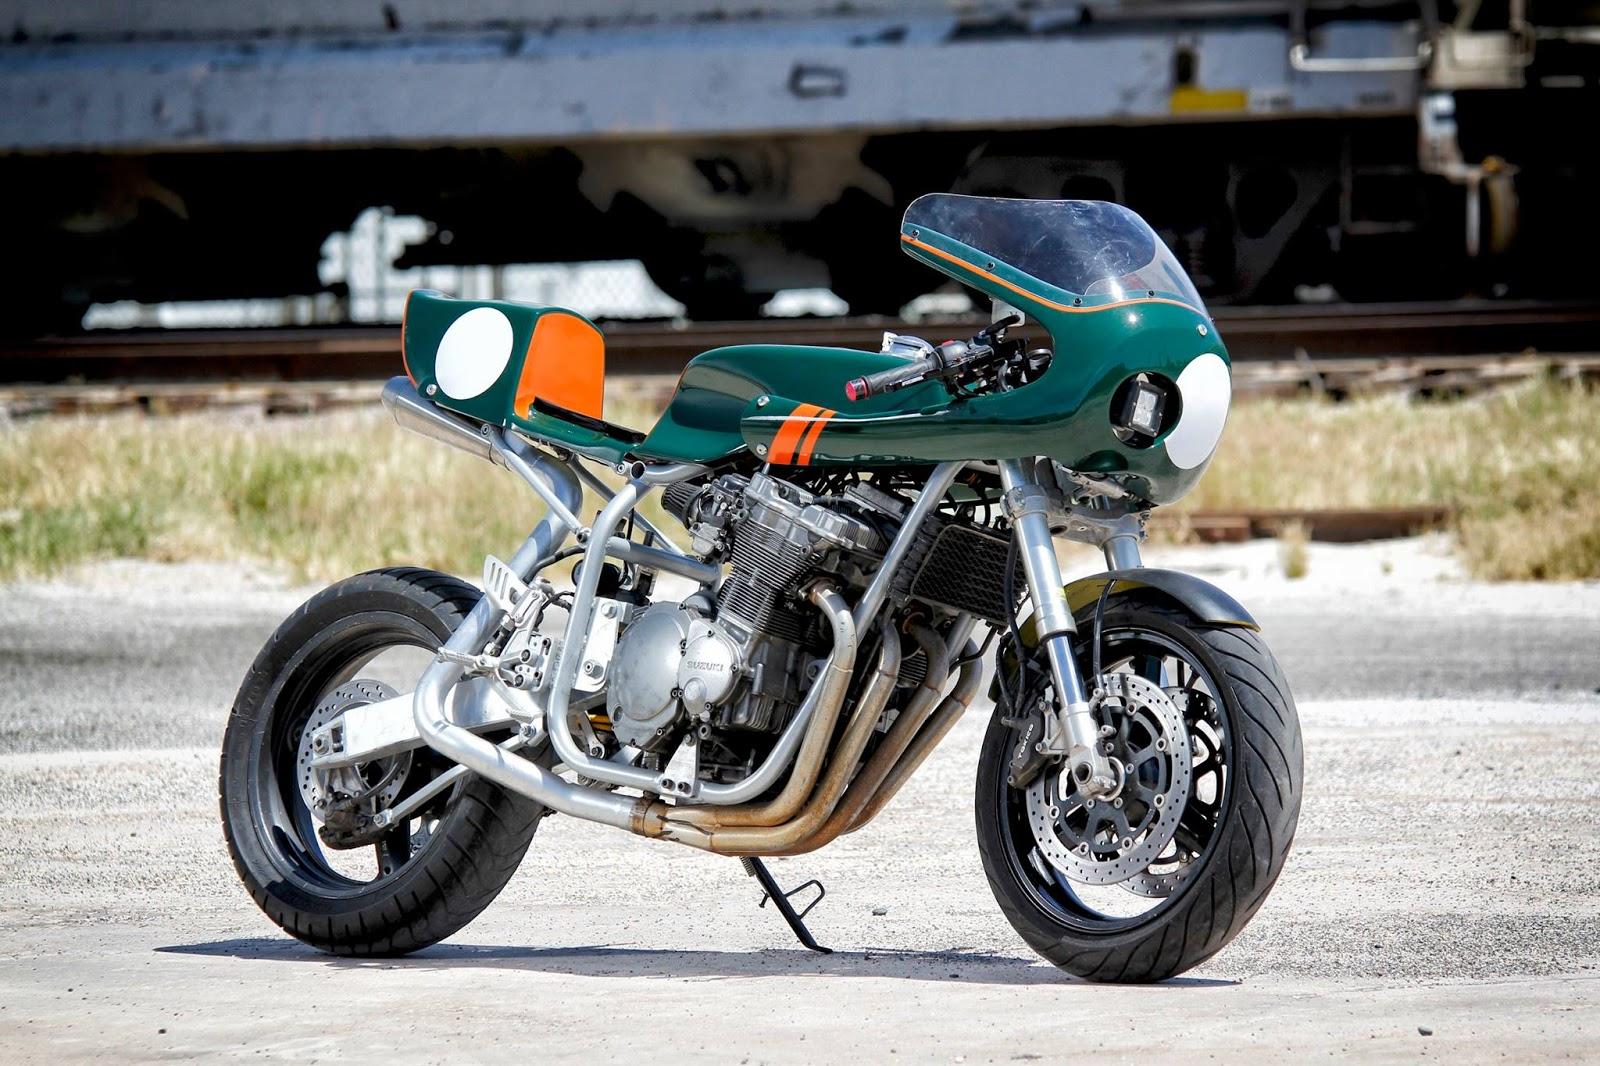 Diy Kit Motorcycle Cafe Racer Kit Rocketgarage Cafe